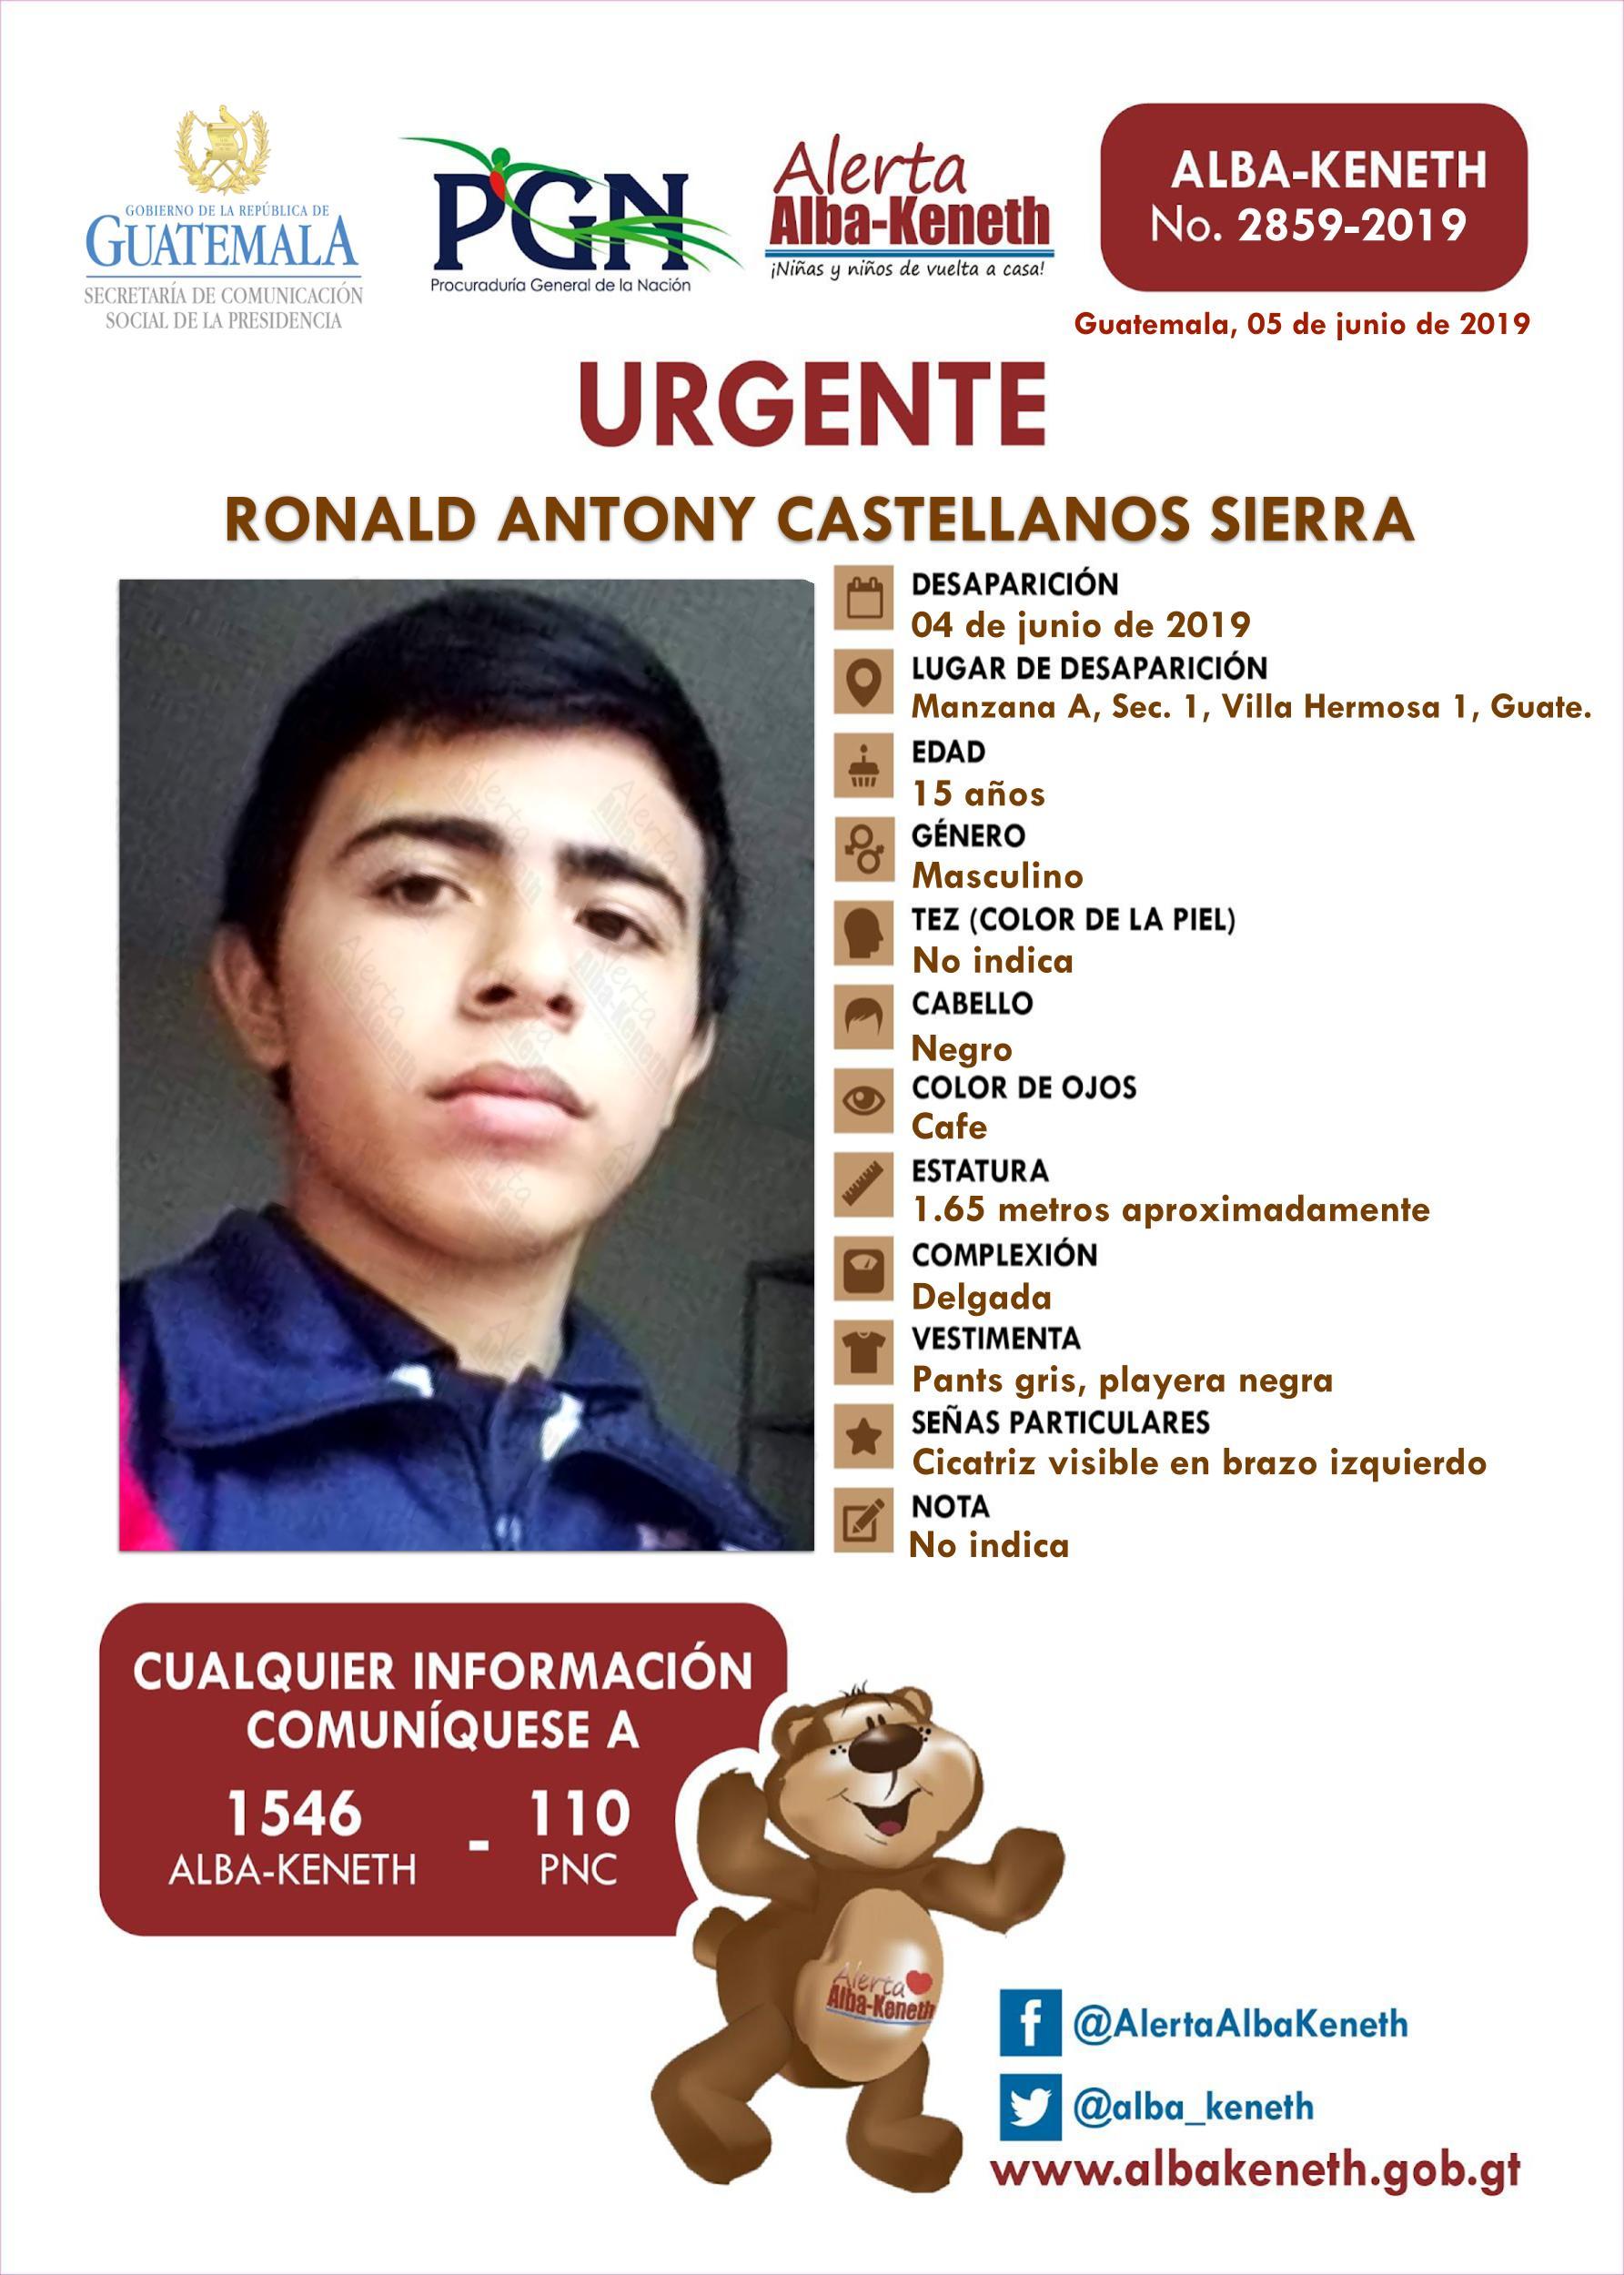 Ronald Antony Castellanos Sierra